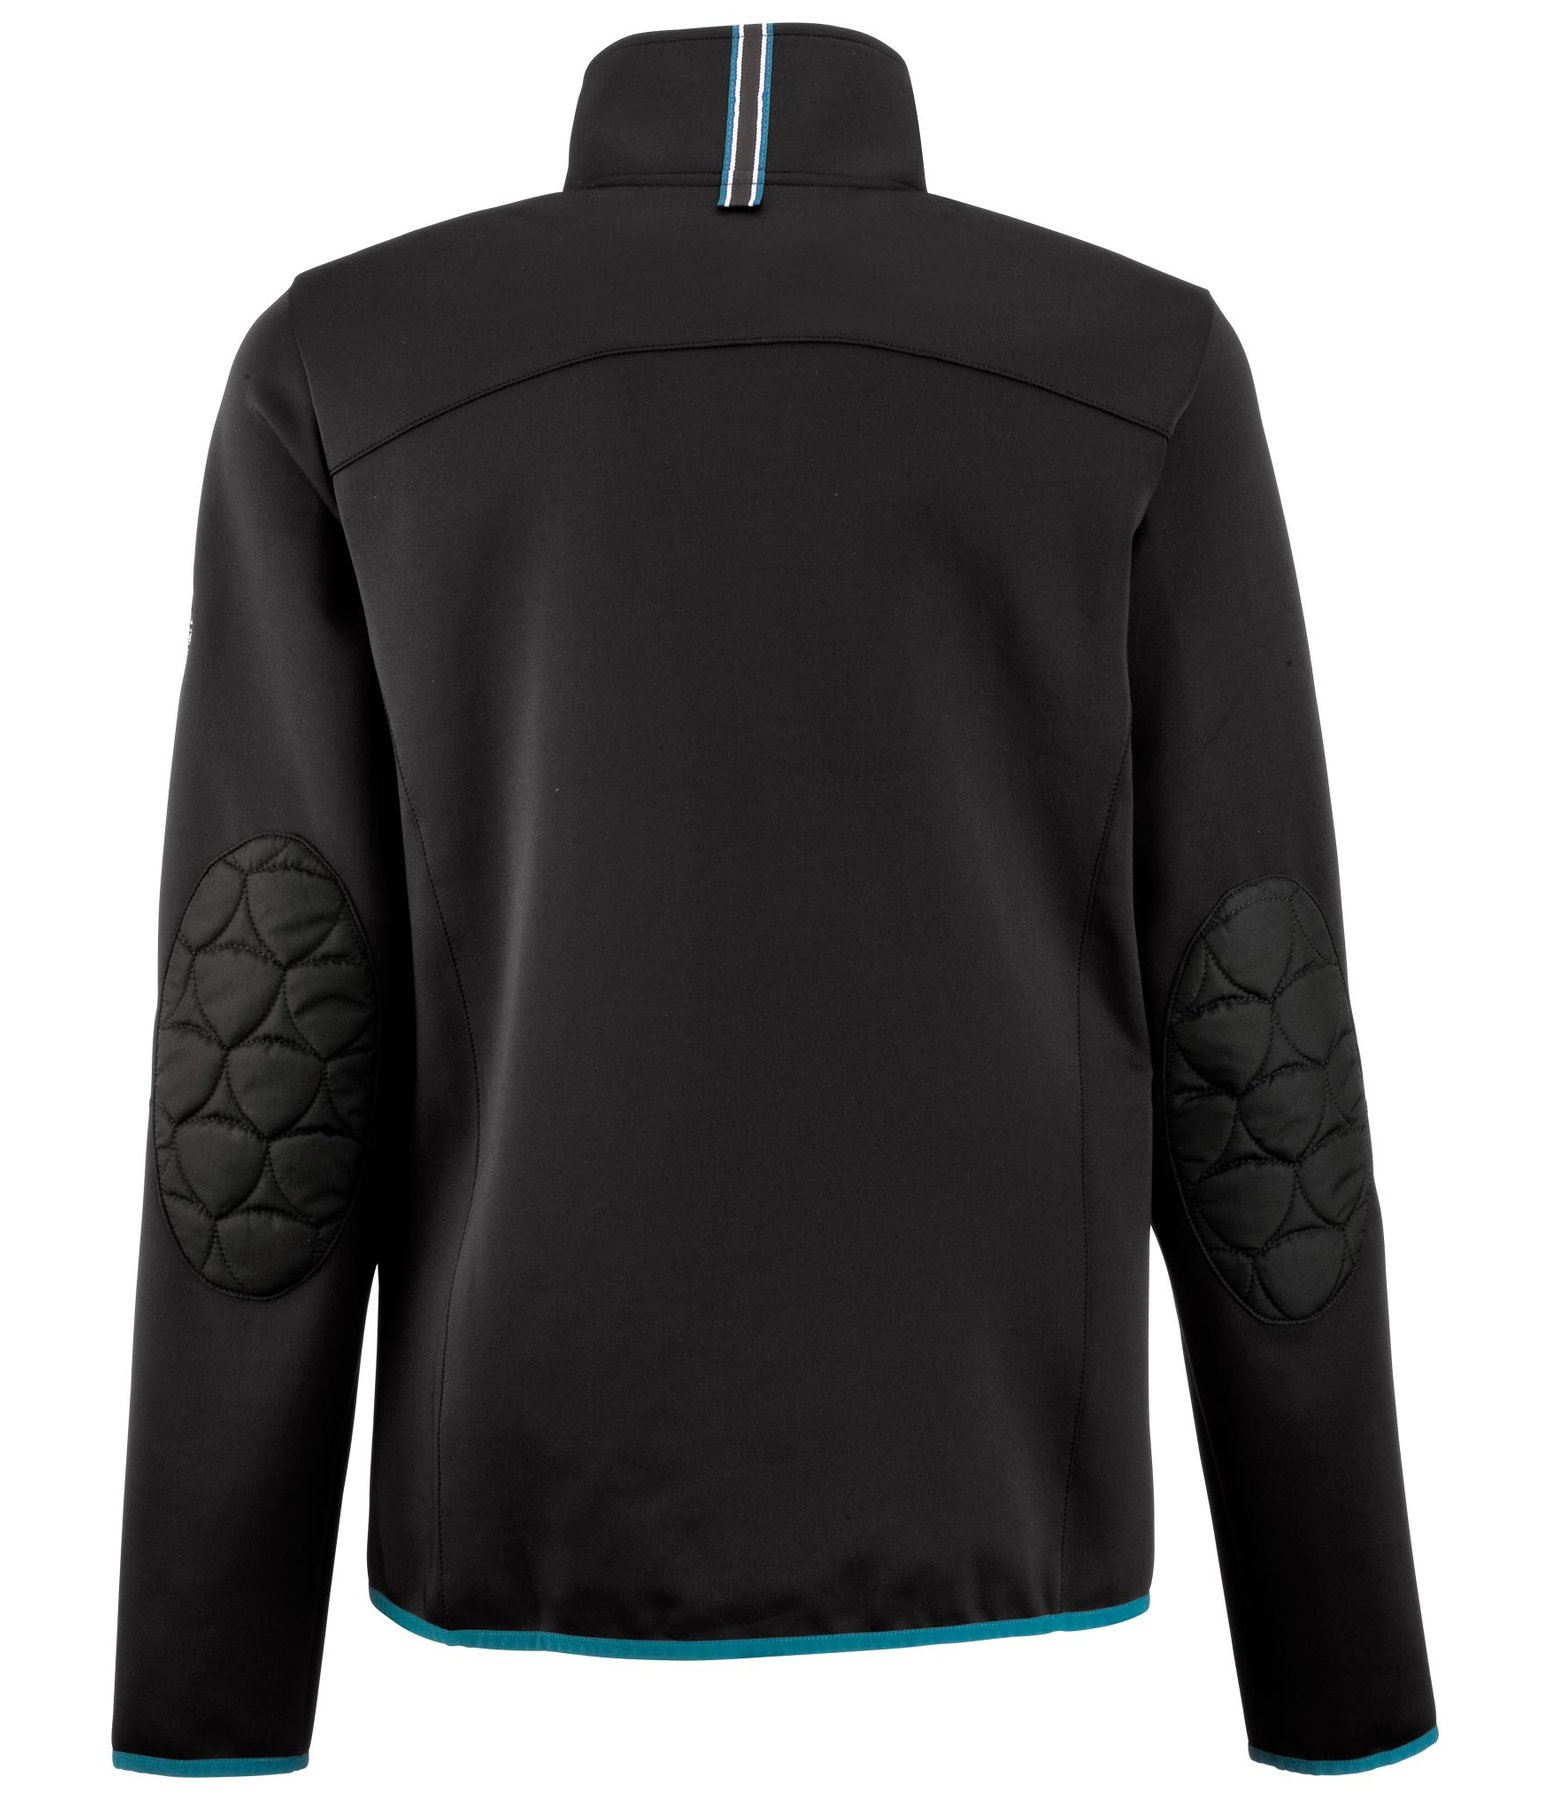 men 39 s combi stretch jacket armin men 39 s riding jackets. Black Bedroom Furniture Sets. Home Design Ideas